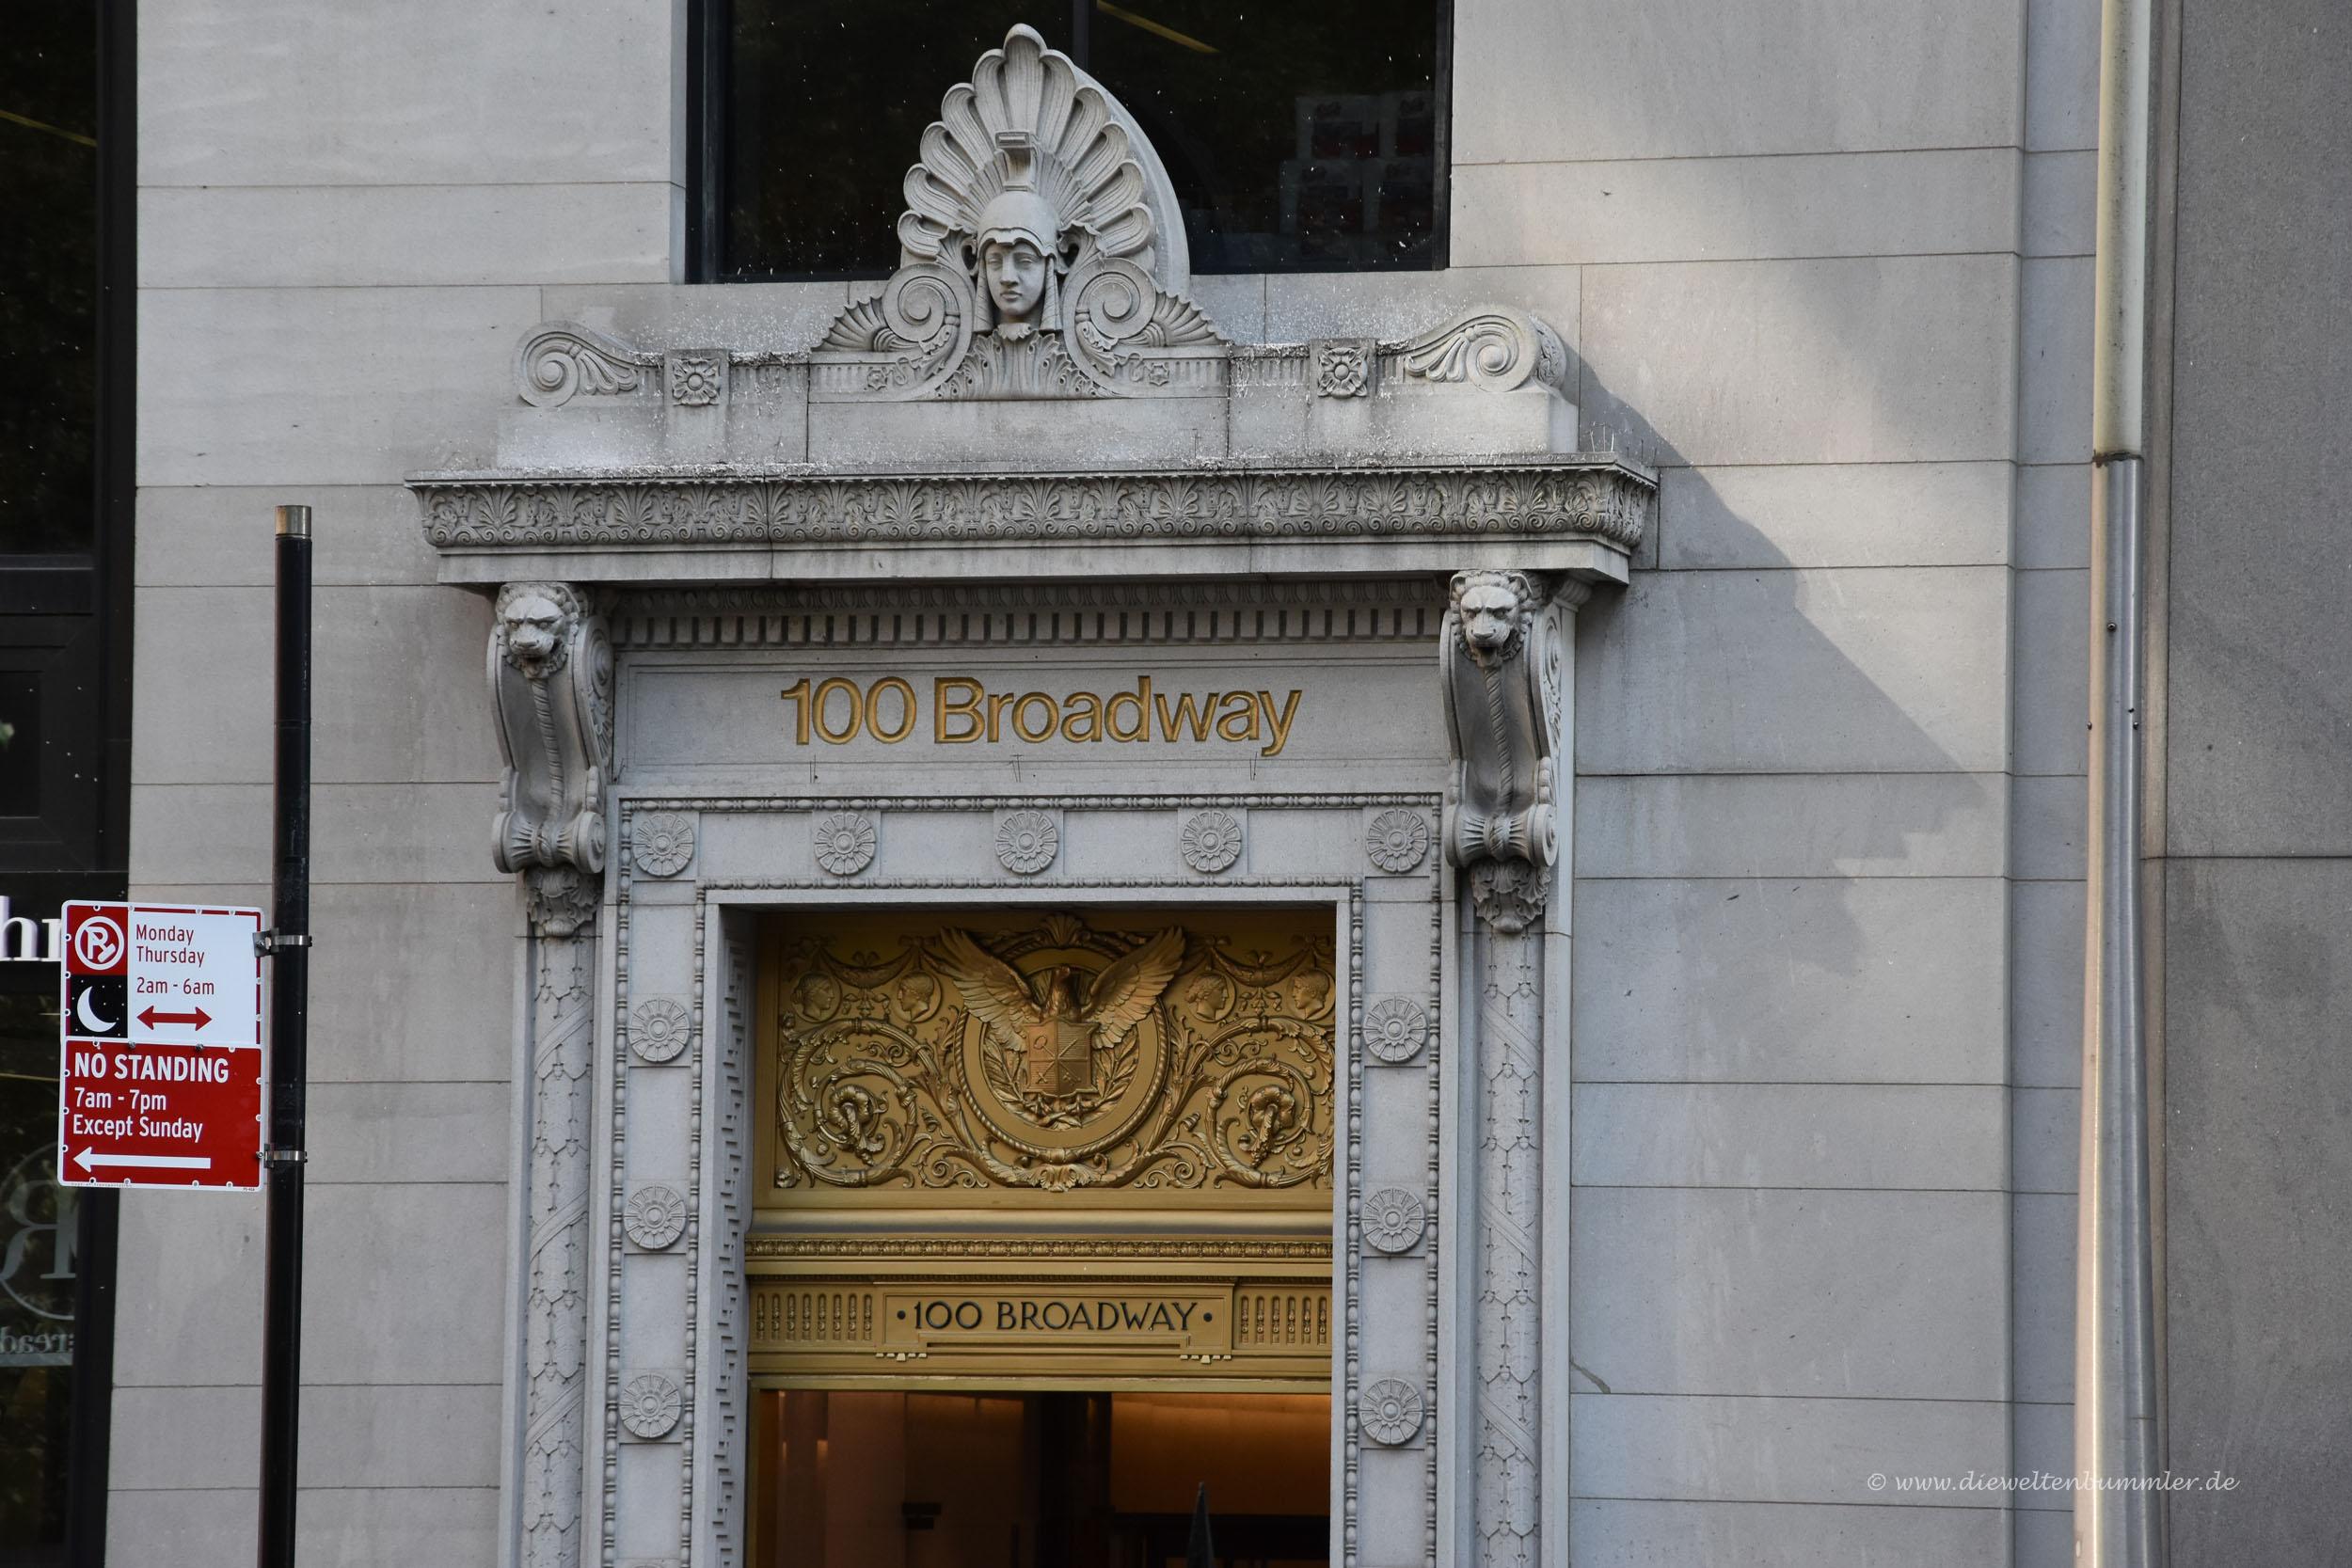 Broadway Nummer 100